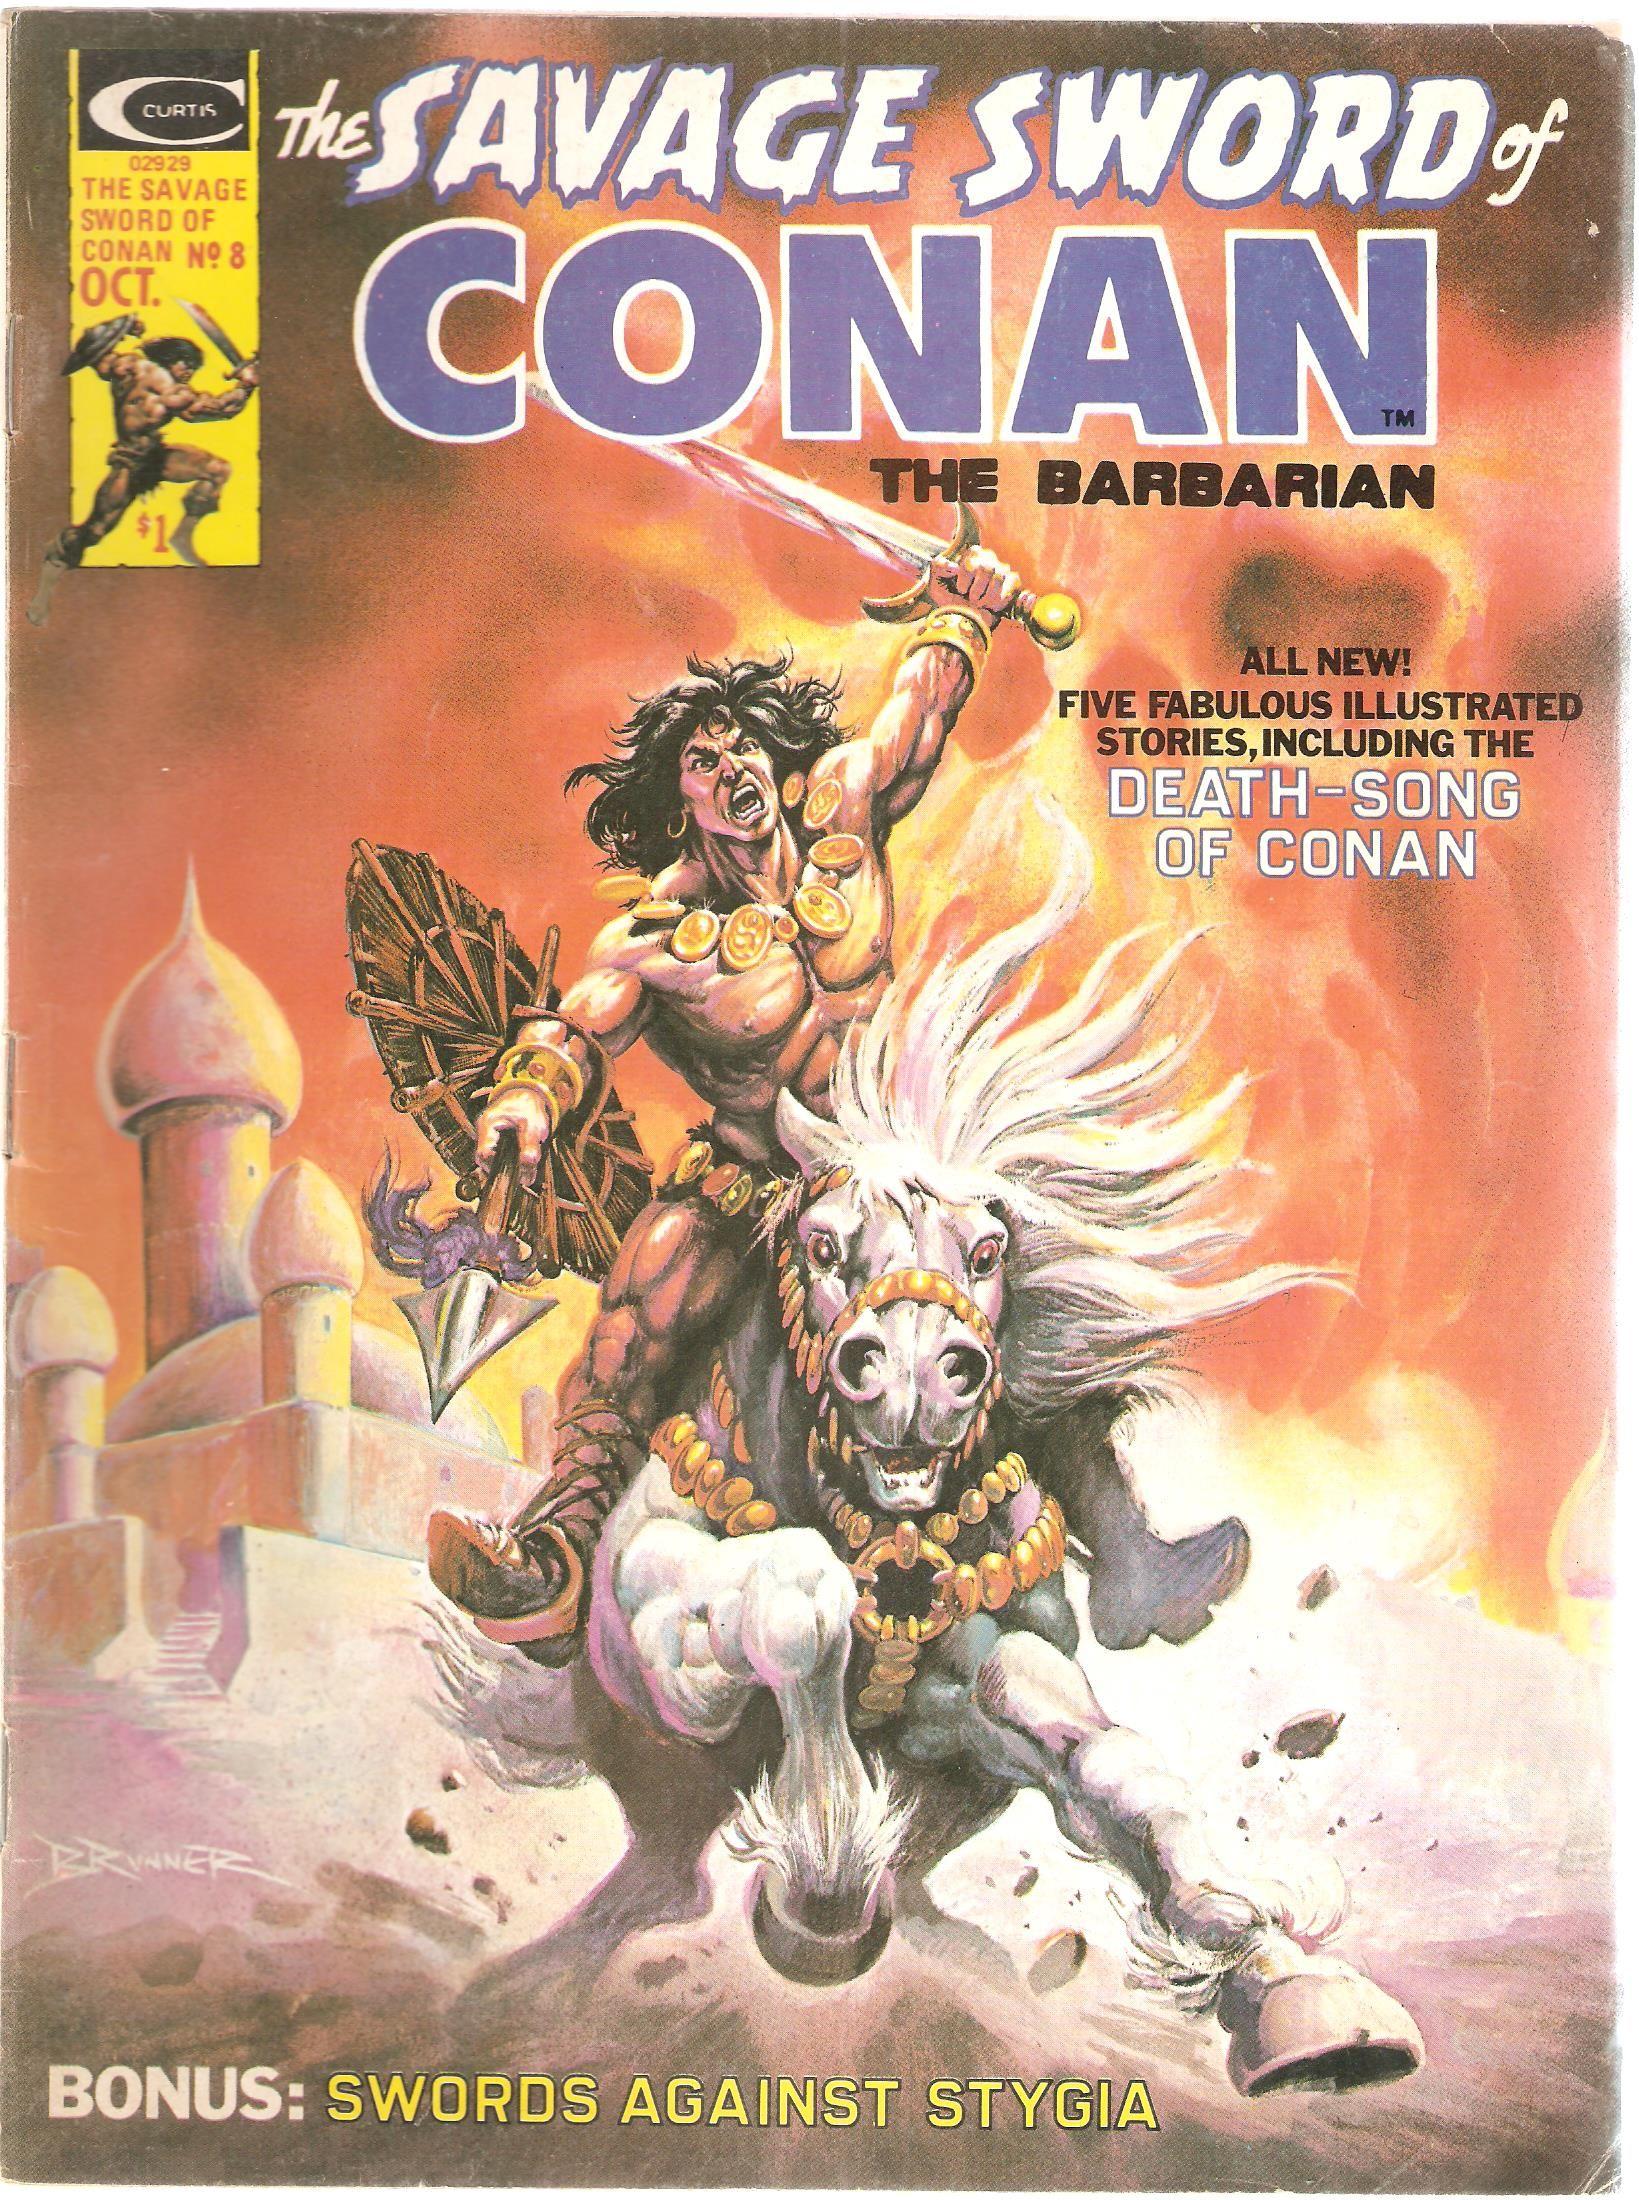 The Savage Sword of Conan the Barbarian. Vol. 1, No. 8. U.S. Comic. Oct. 1975.